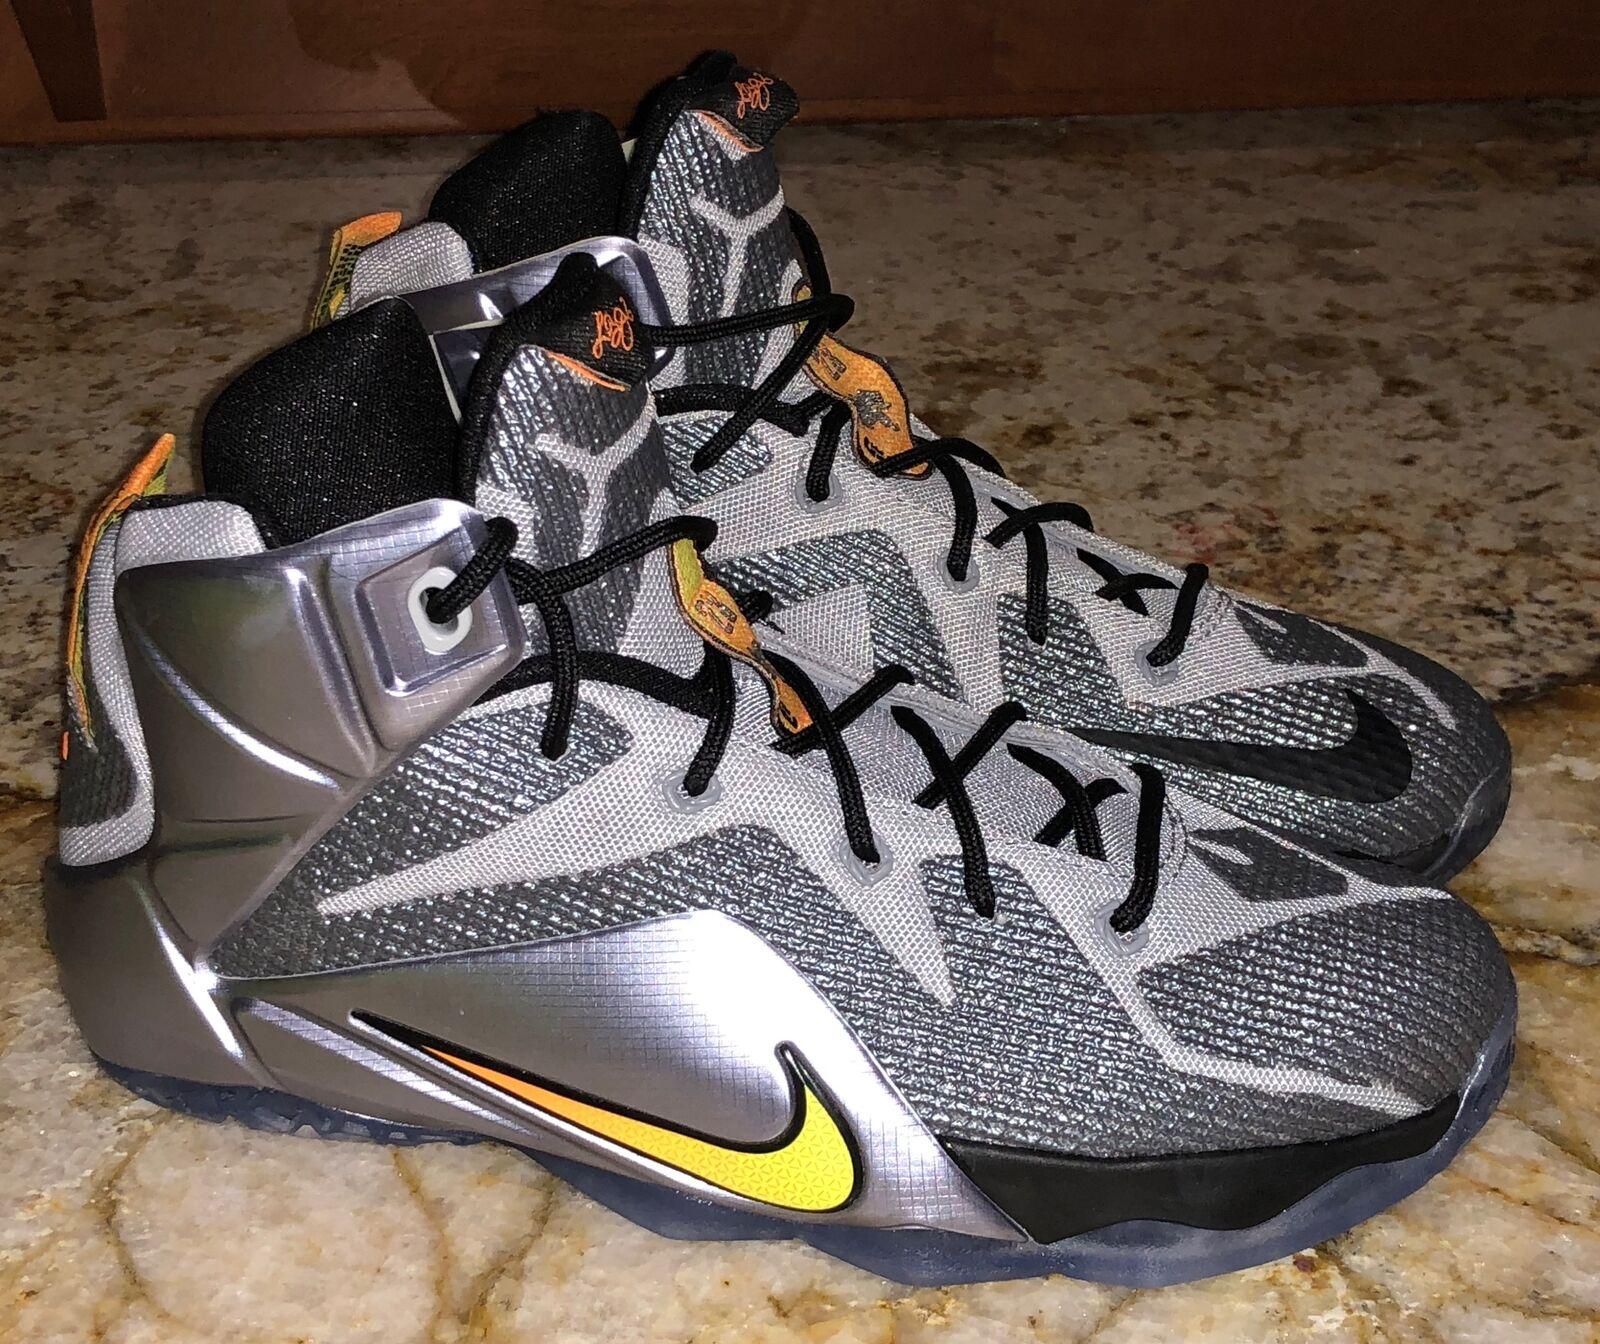 lebron james the twelve shoes price